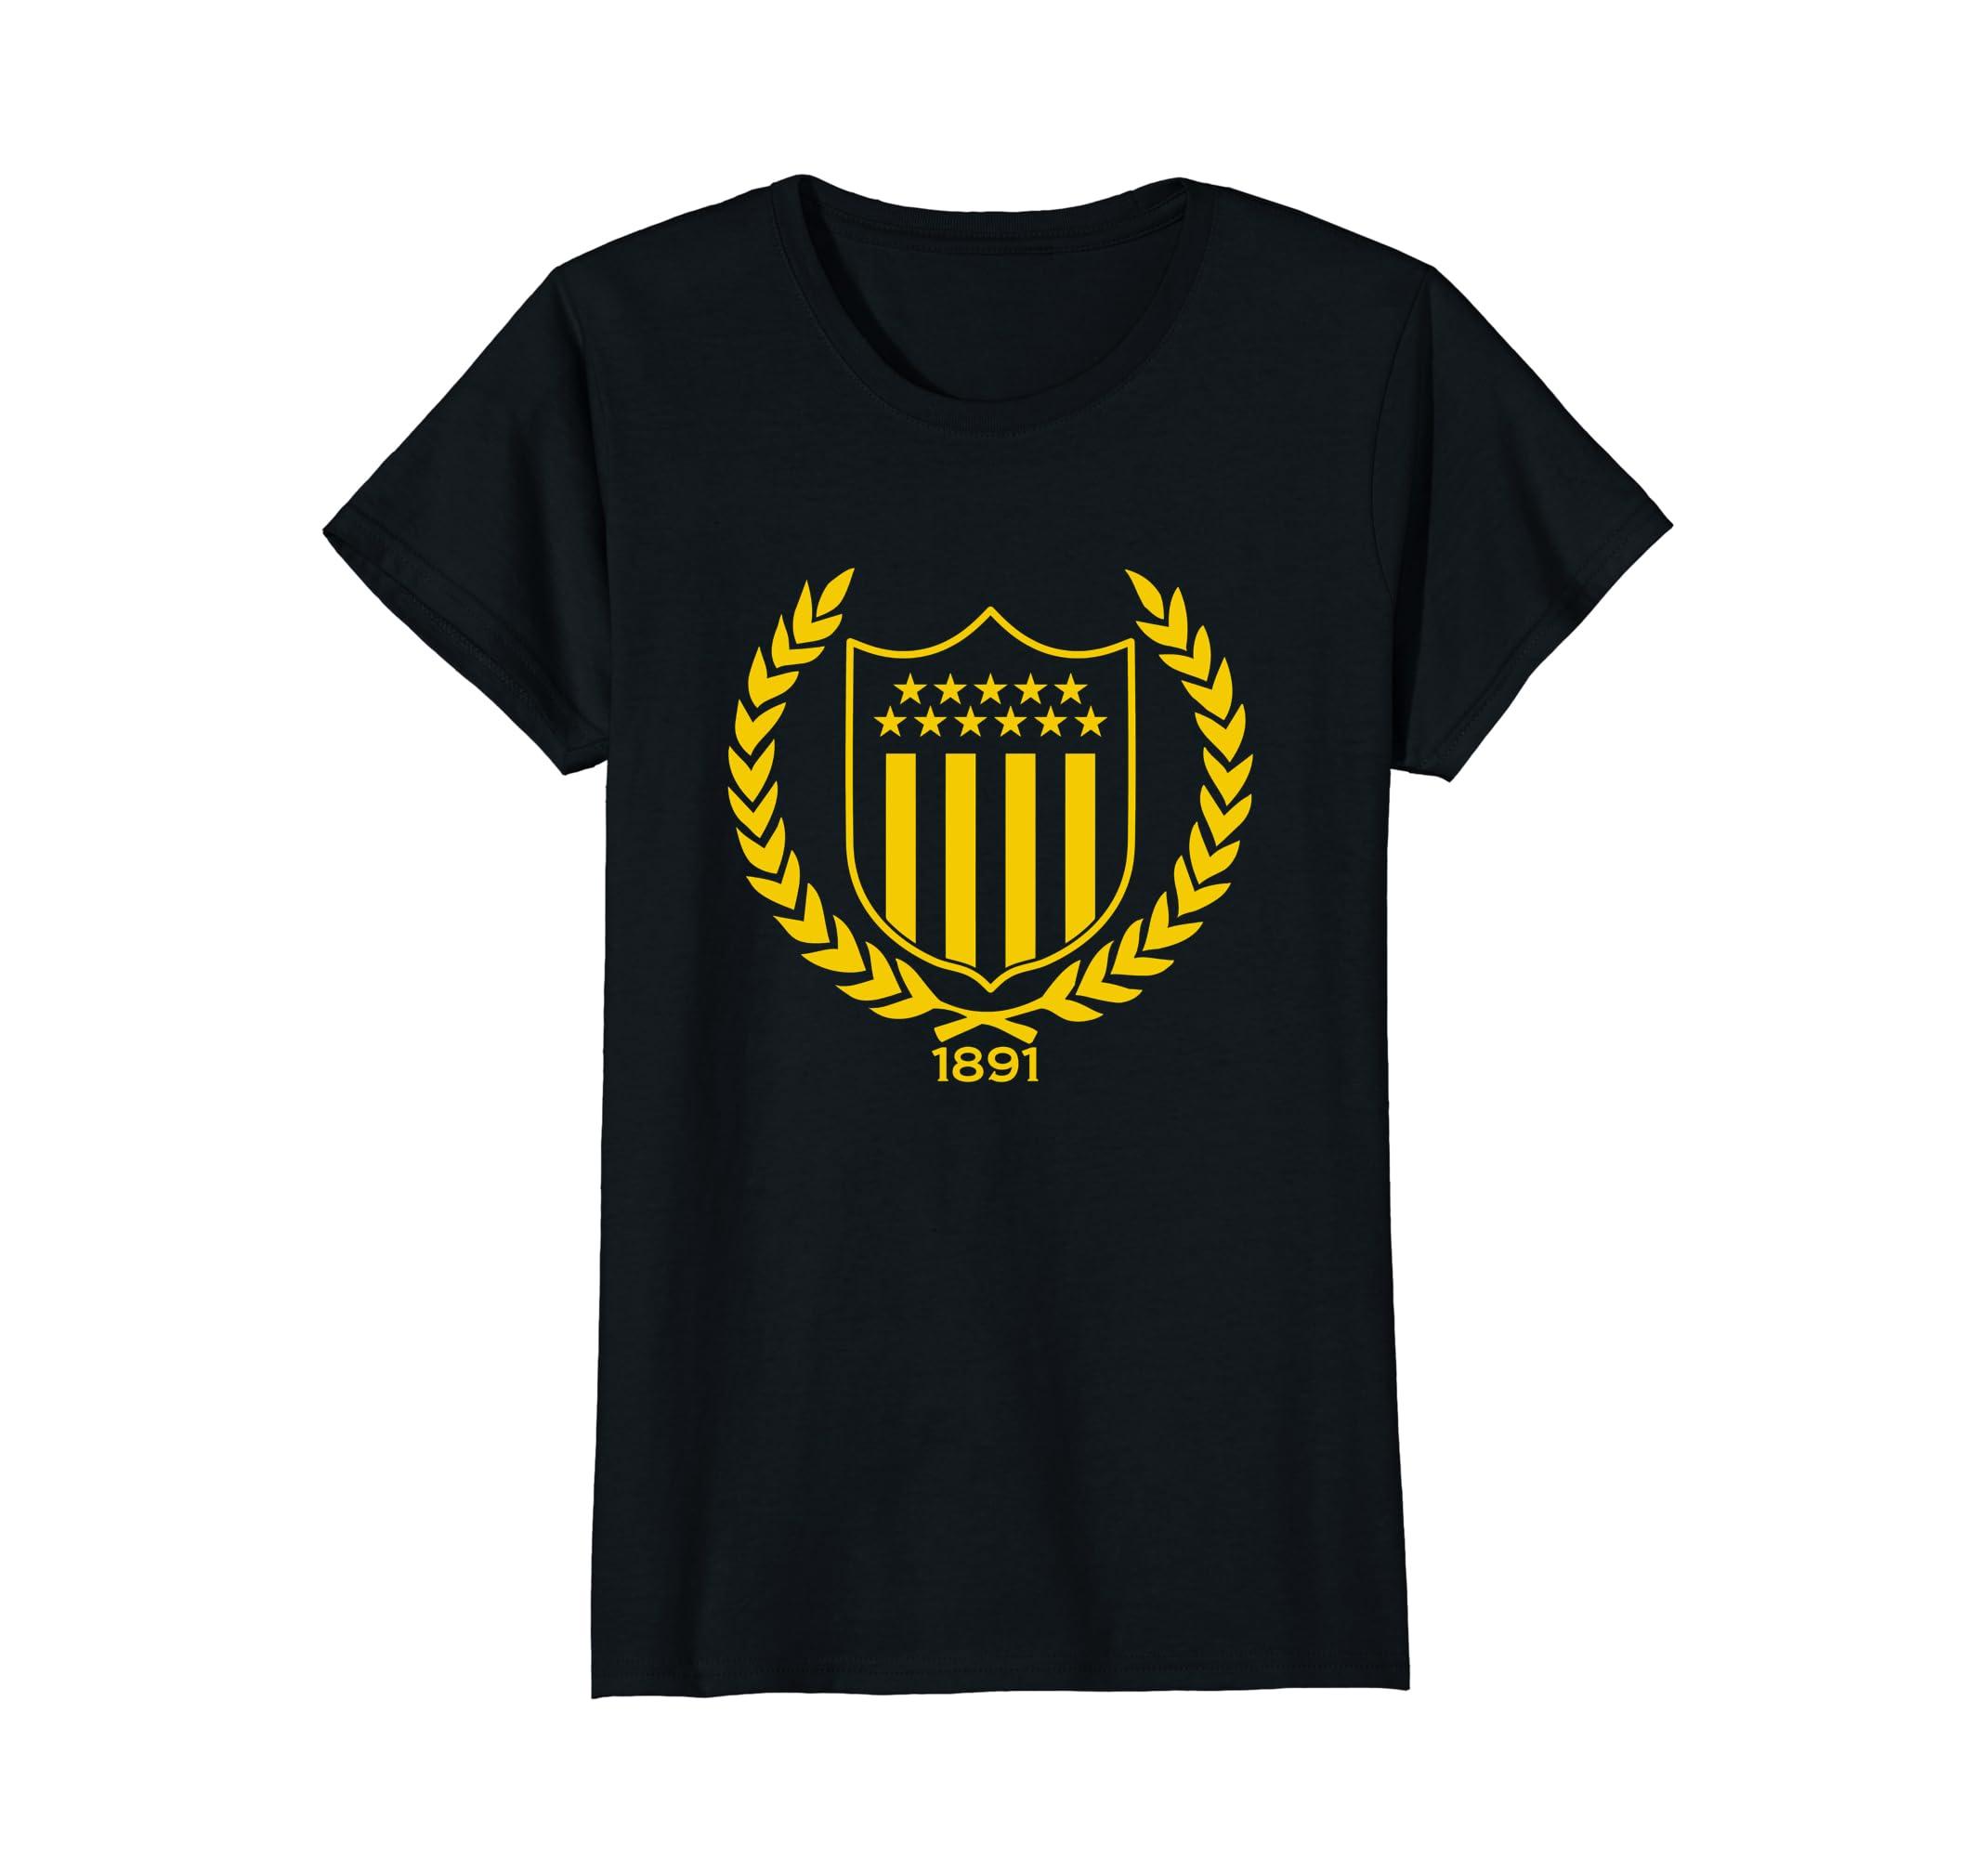 Amazon.com: Club Atletico Penarol Uruguay Camiseta TShirt Jersey Manya: Clothing